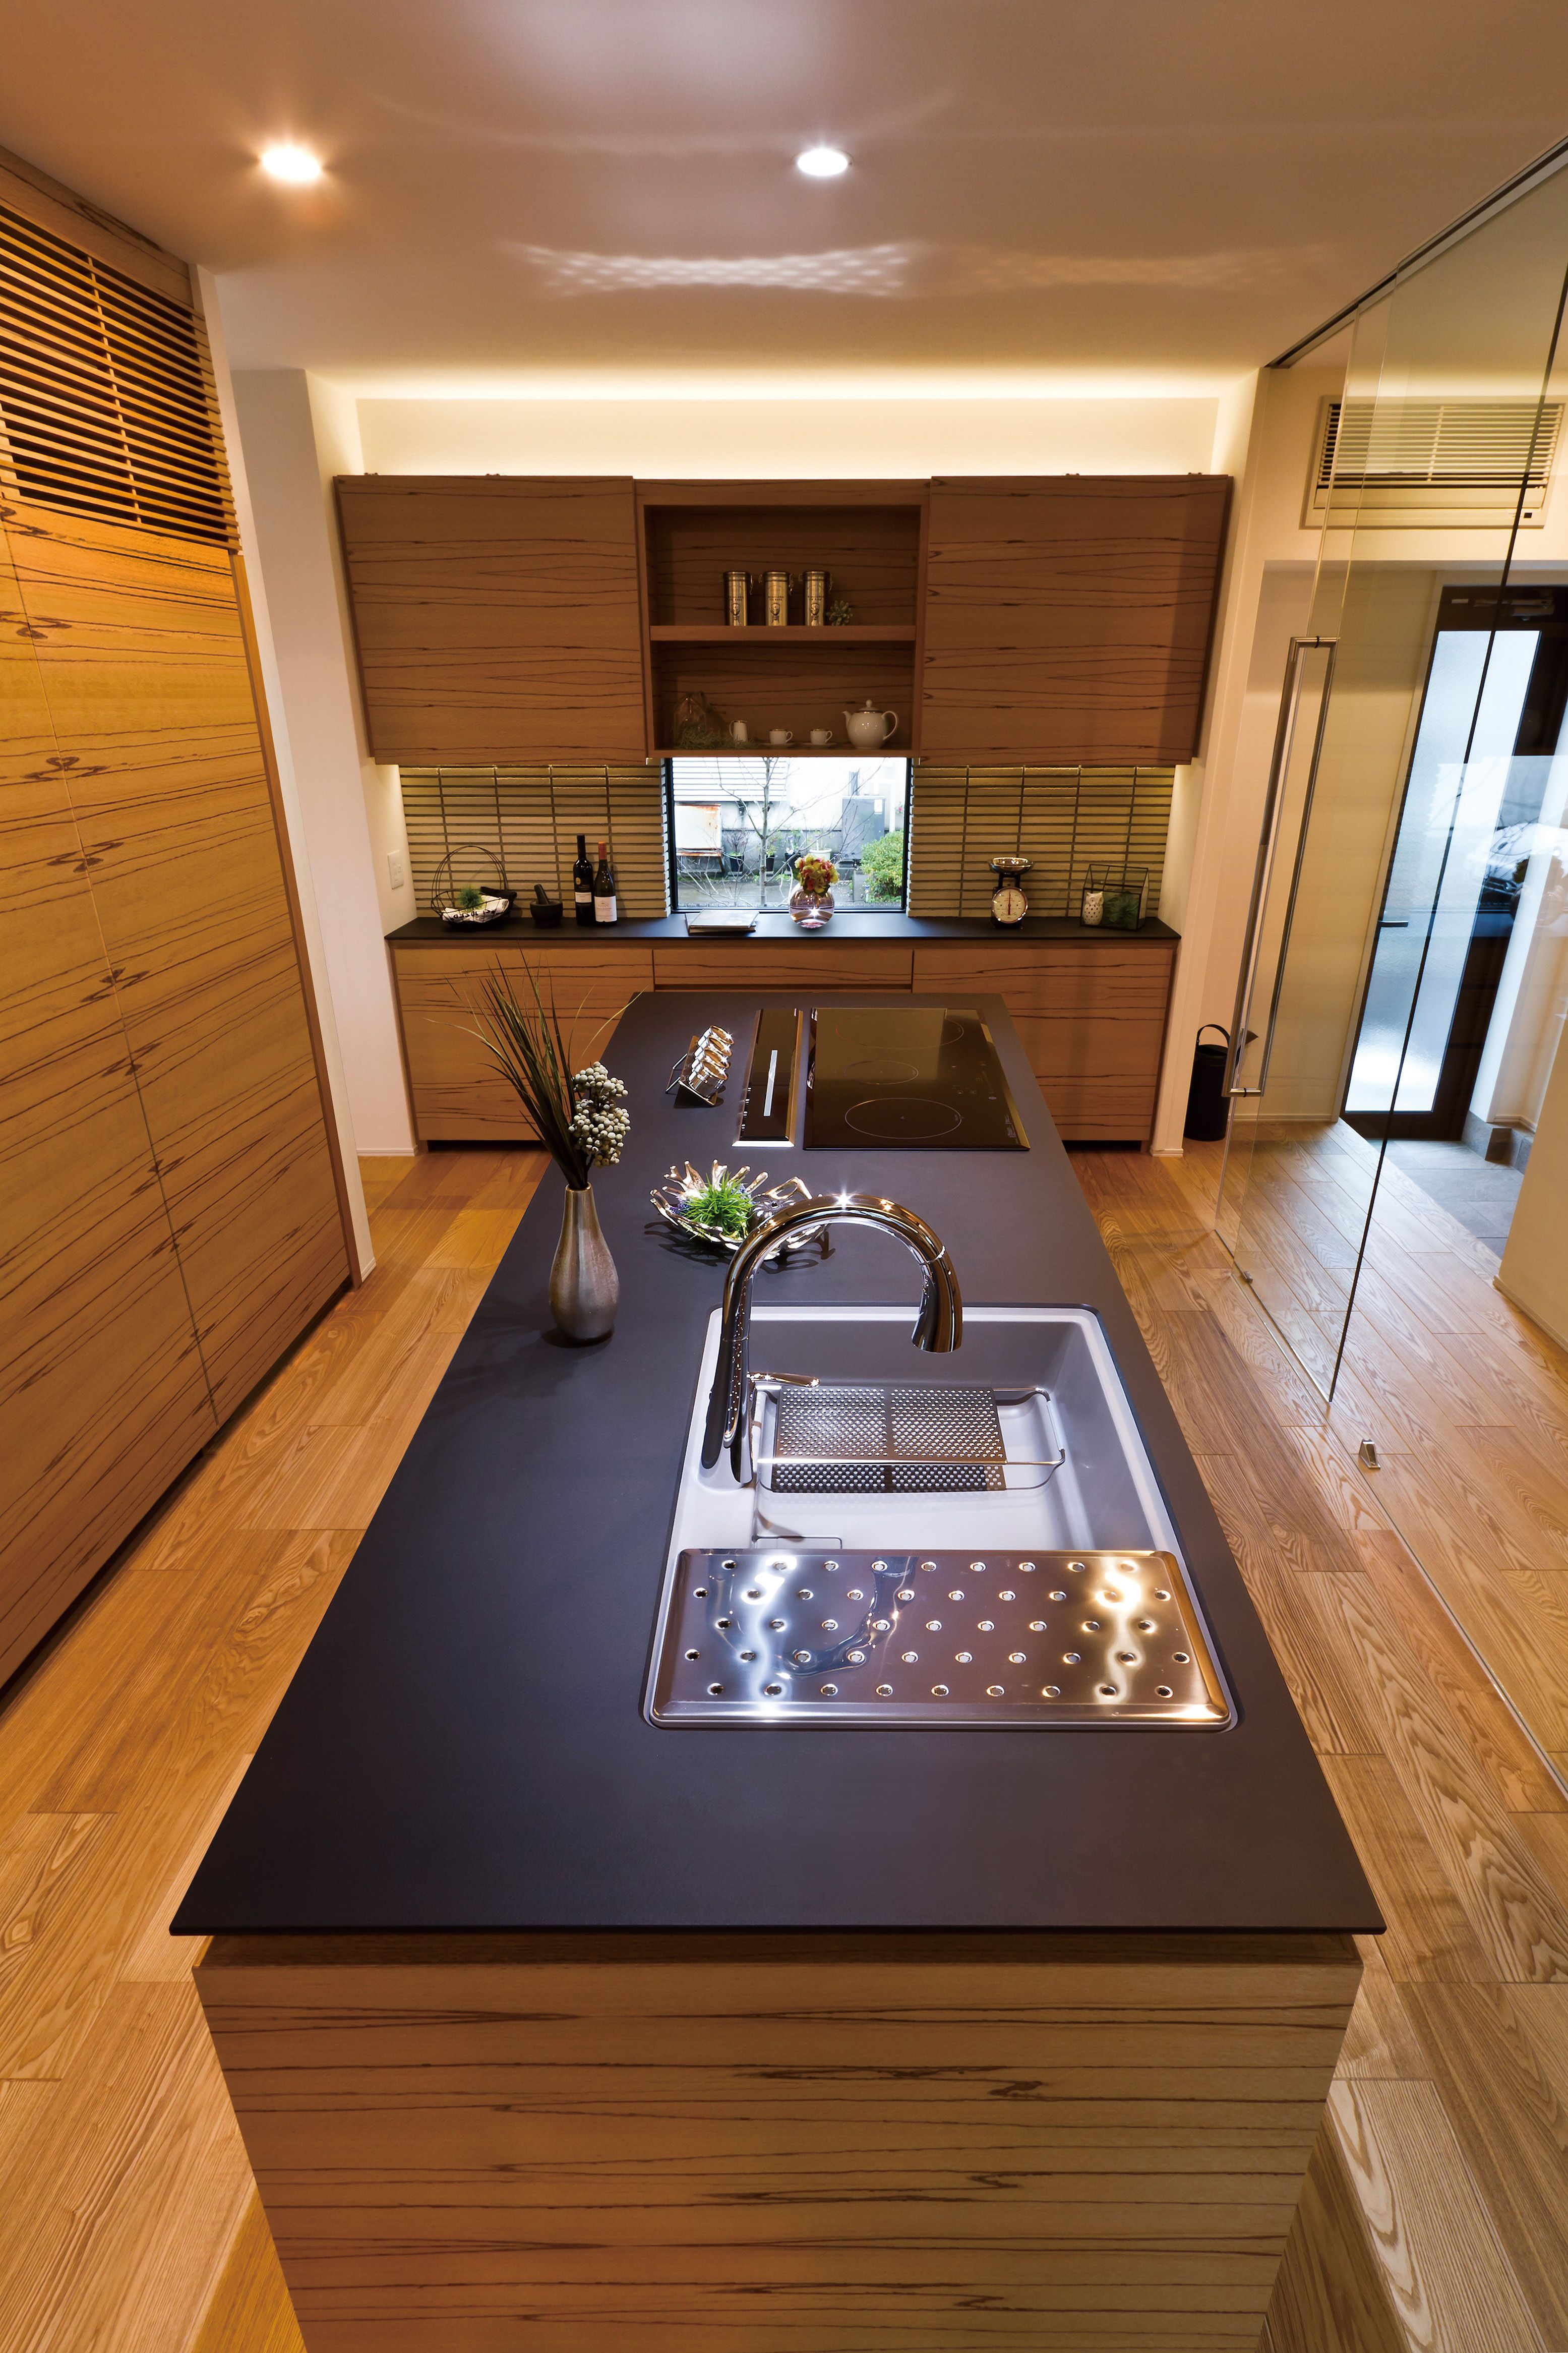 Ultra Surface ウルトラクオーツ キッチン 黒 ブラック 人工大理石